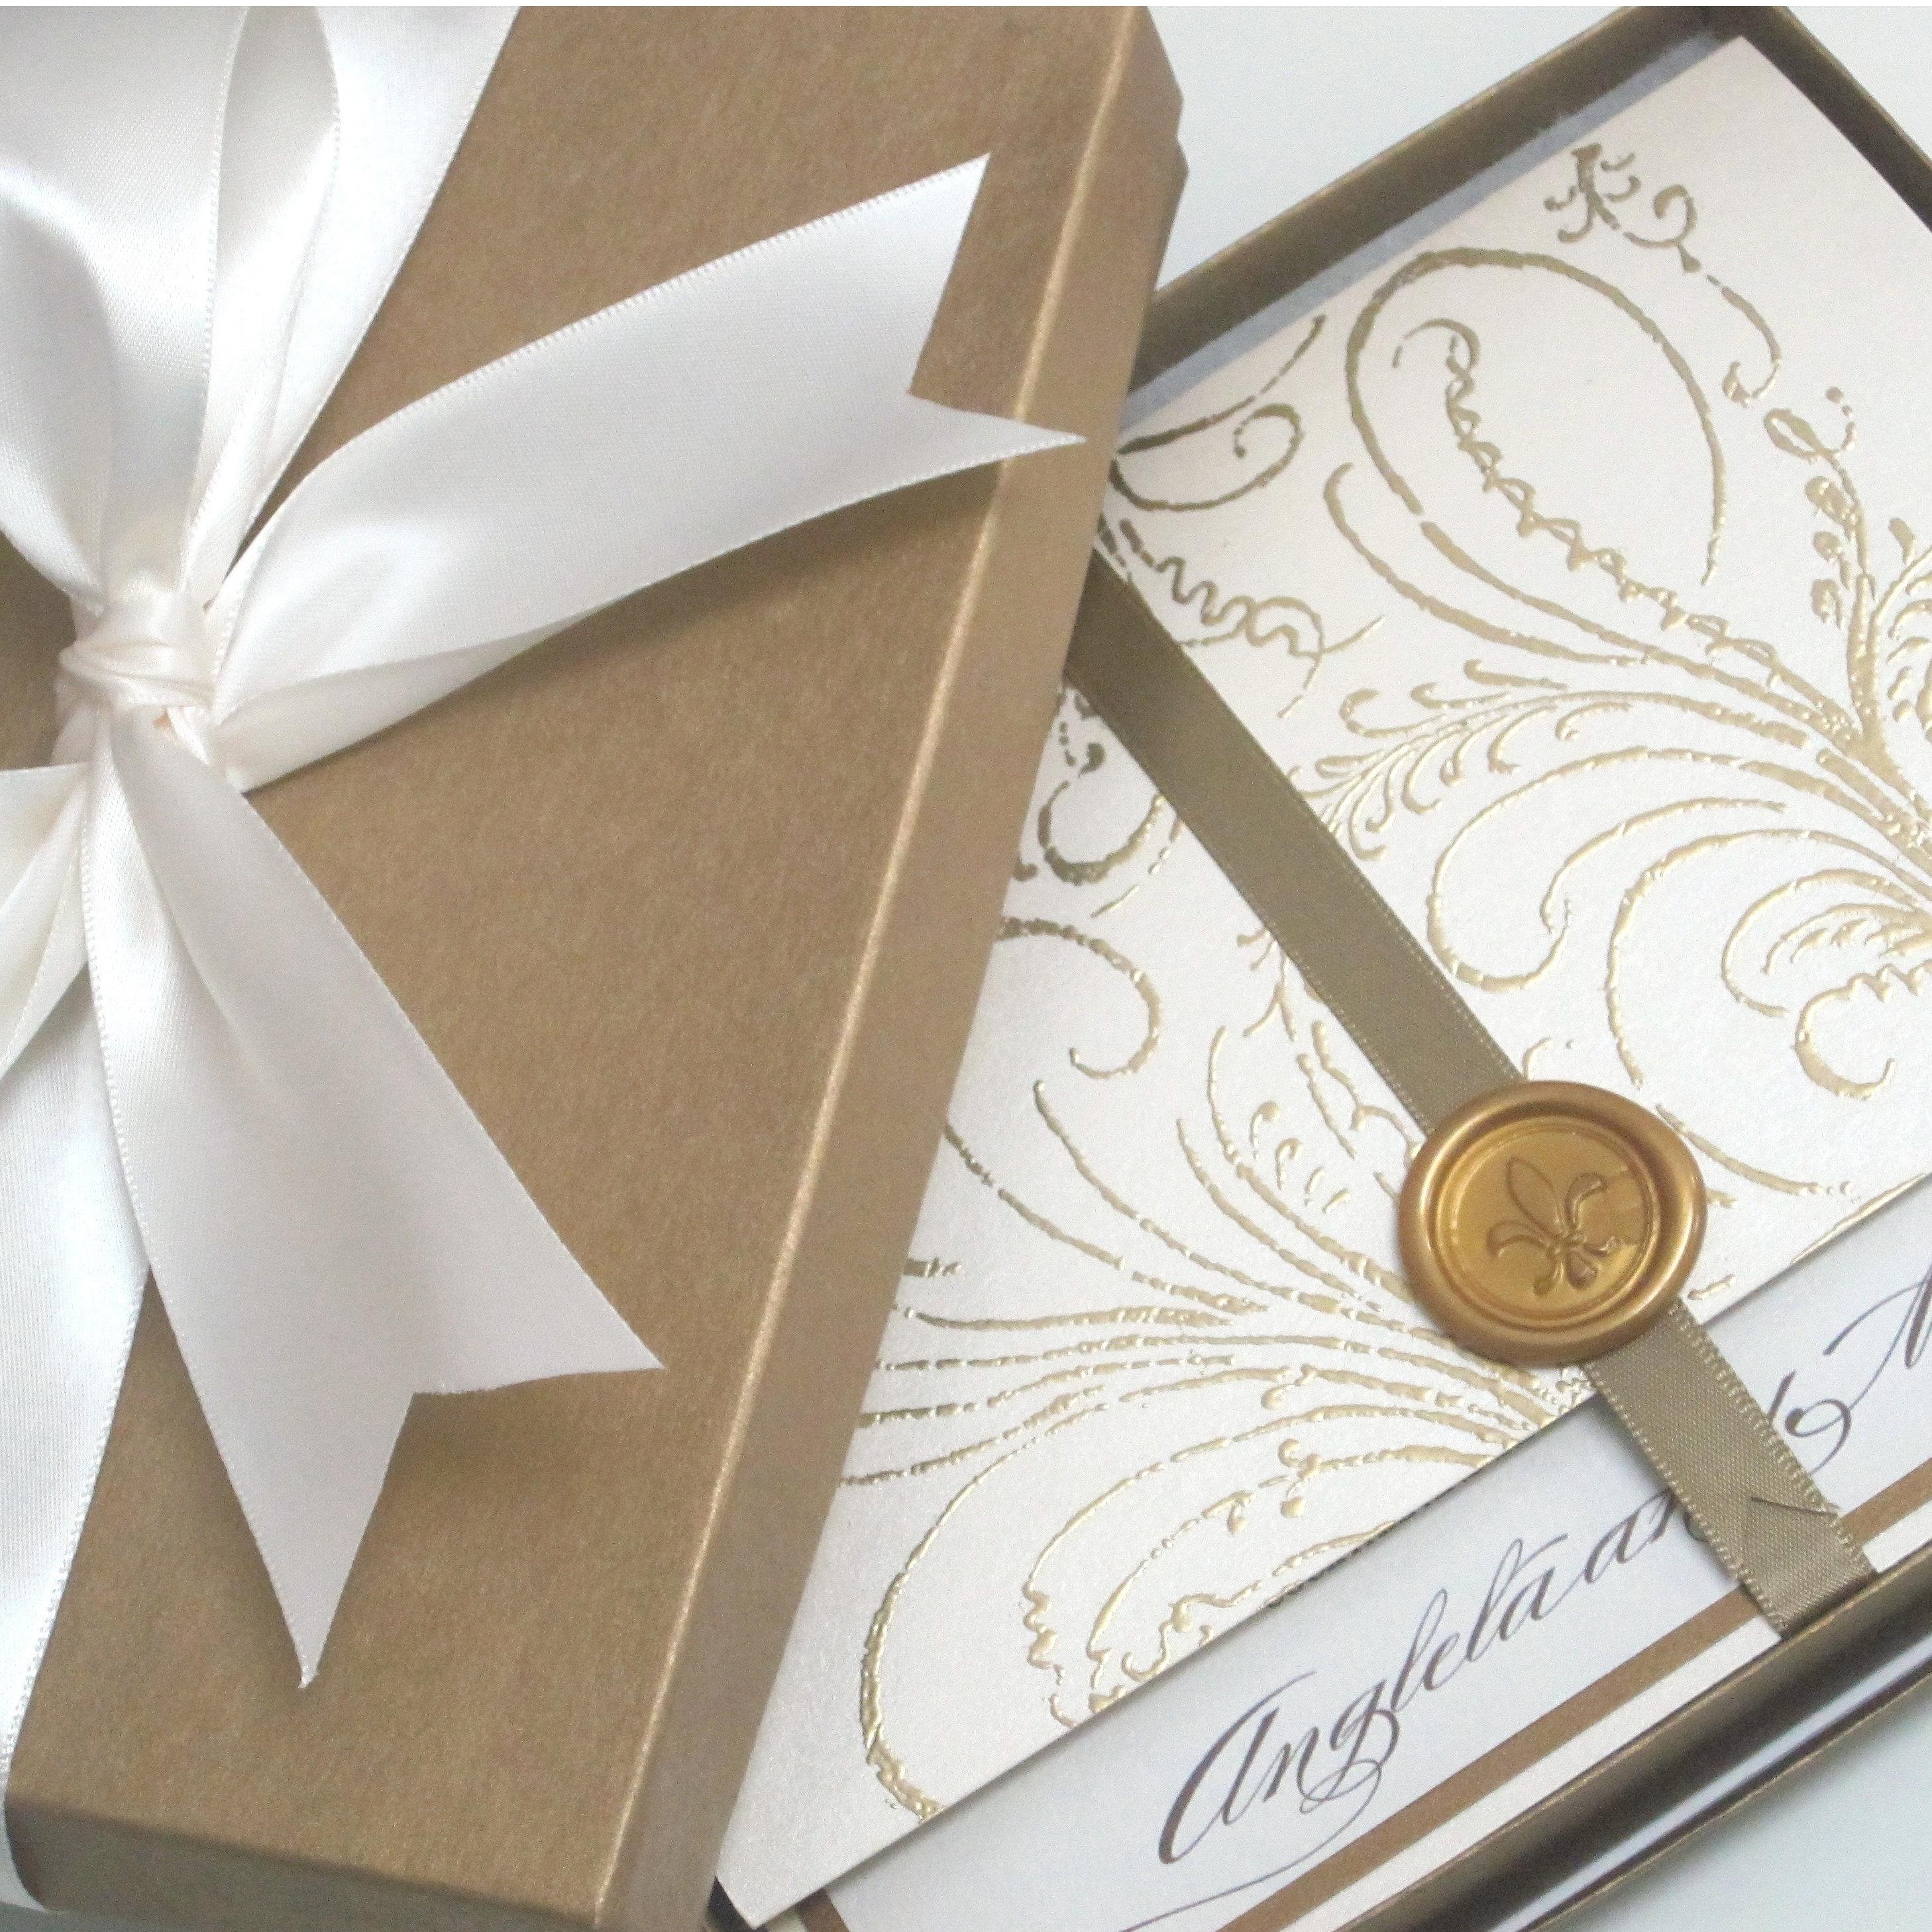 French Vintage Wedding Invitations: Vintage Wedding Invitation Sample Whimsical French Baroque